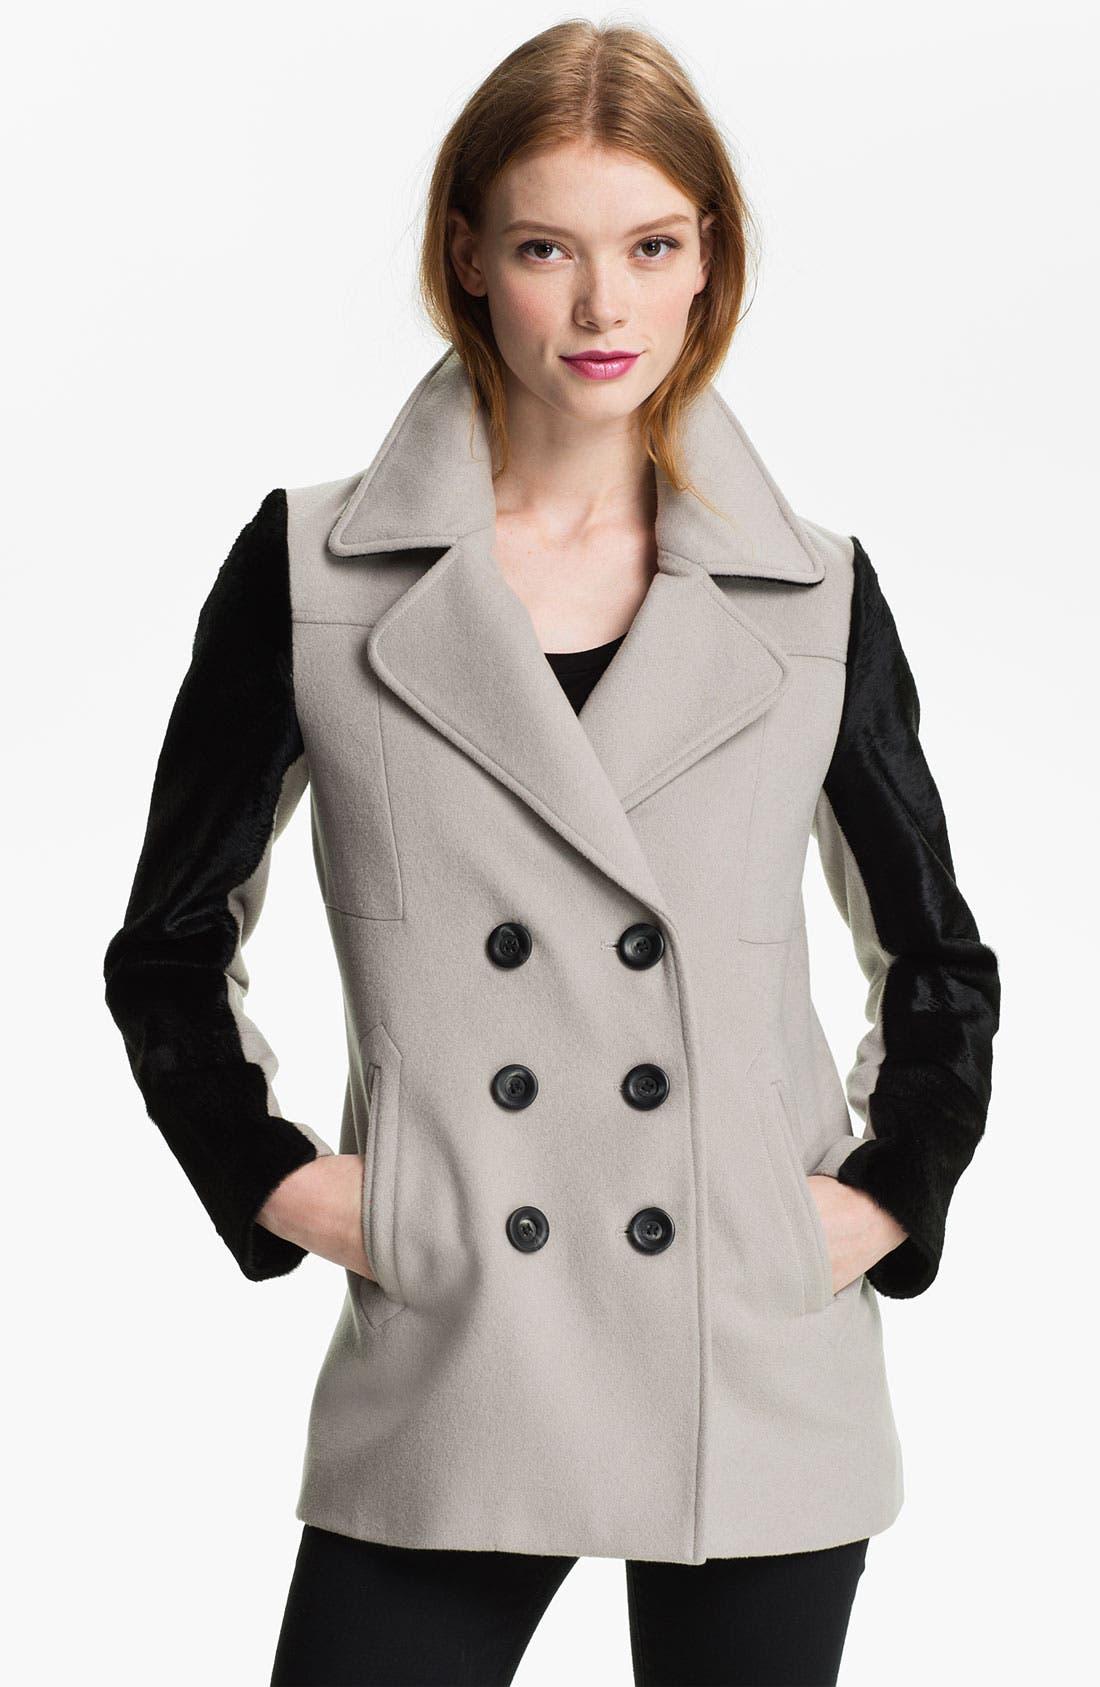 Alternate Image 1 Selected - Rebecca Minkoff 'Jamison' Genuine Calf Hair Sleeve Jacket